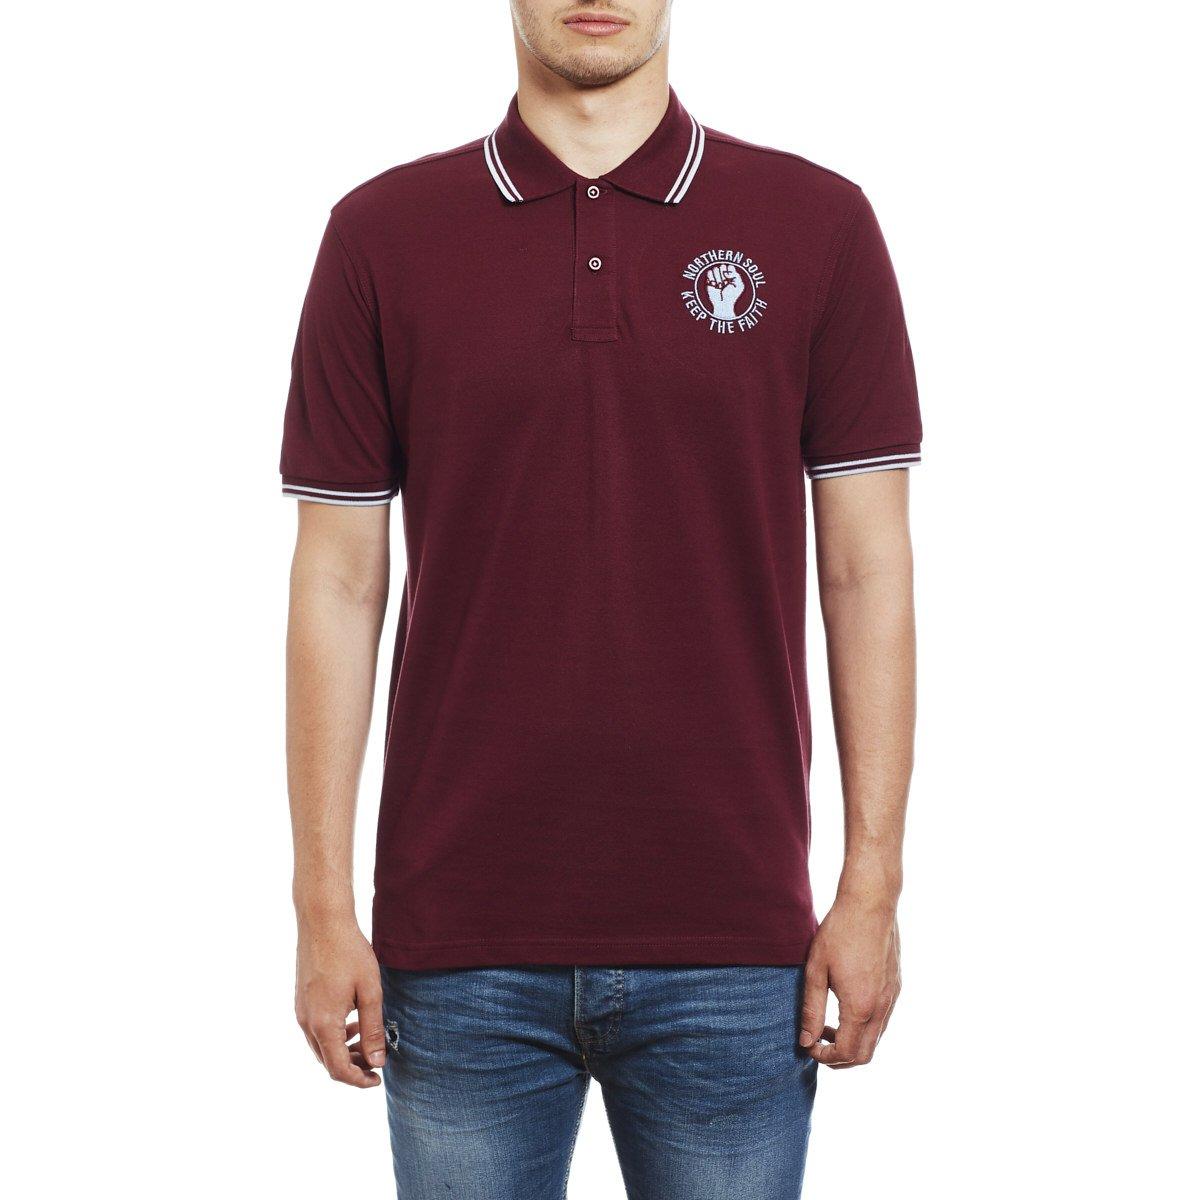 Northern Soul Keep The Faith Embroidered Polo Shirt - Polo para ...